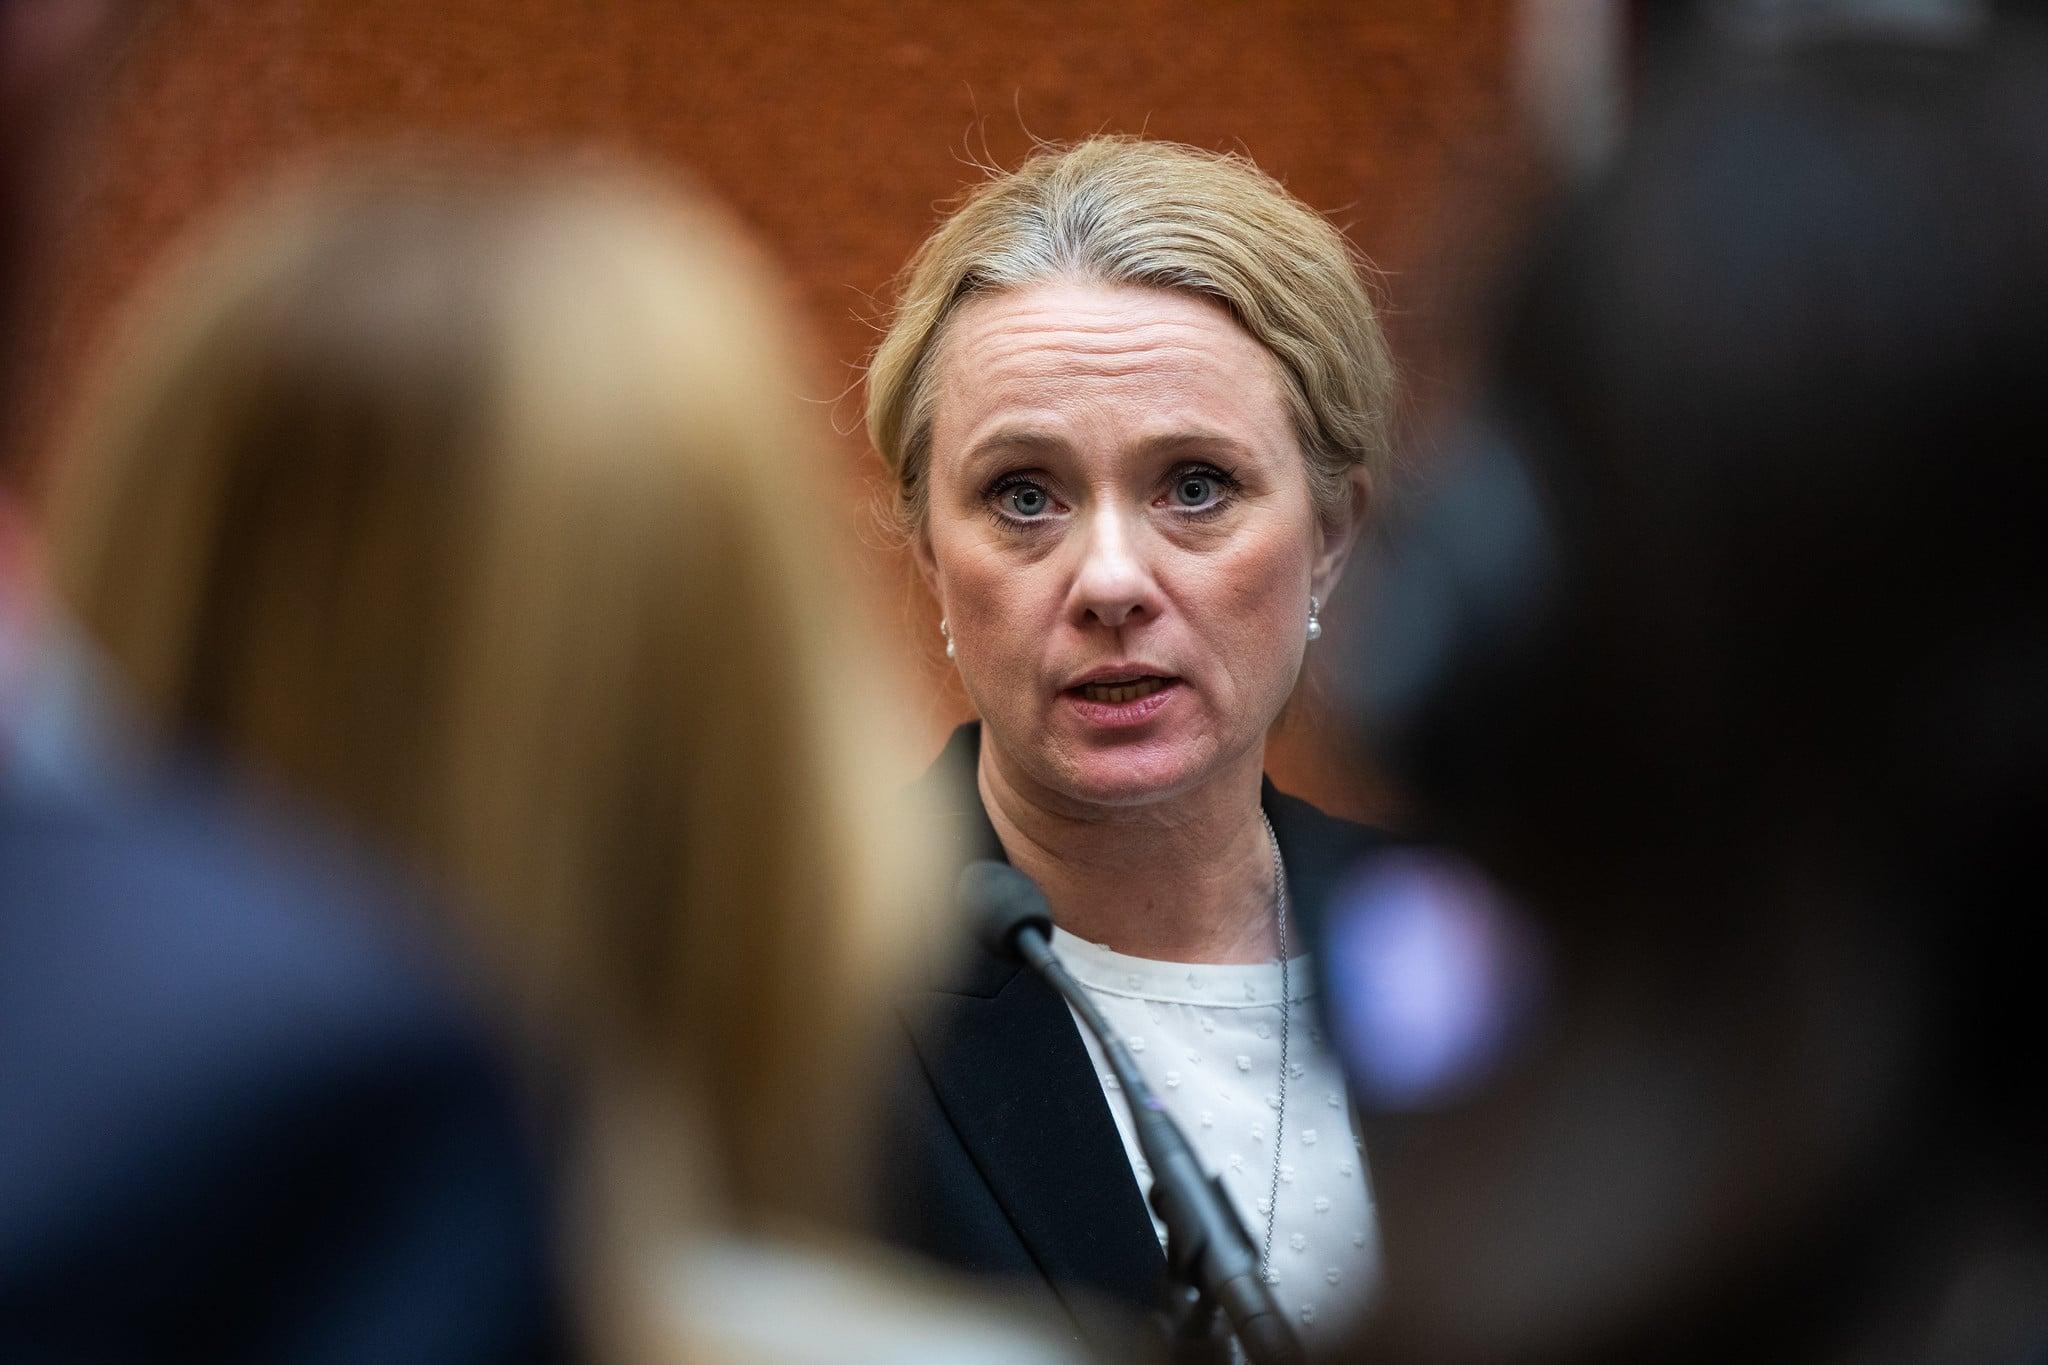 Ny leder i Norsk olje og gass